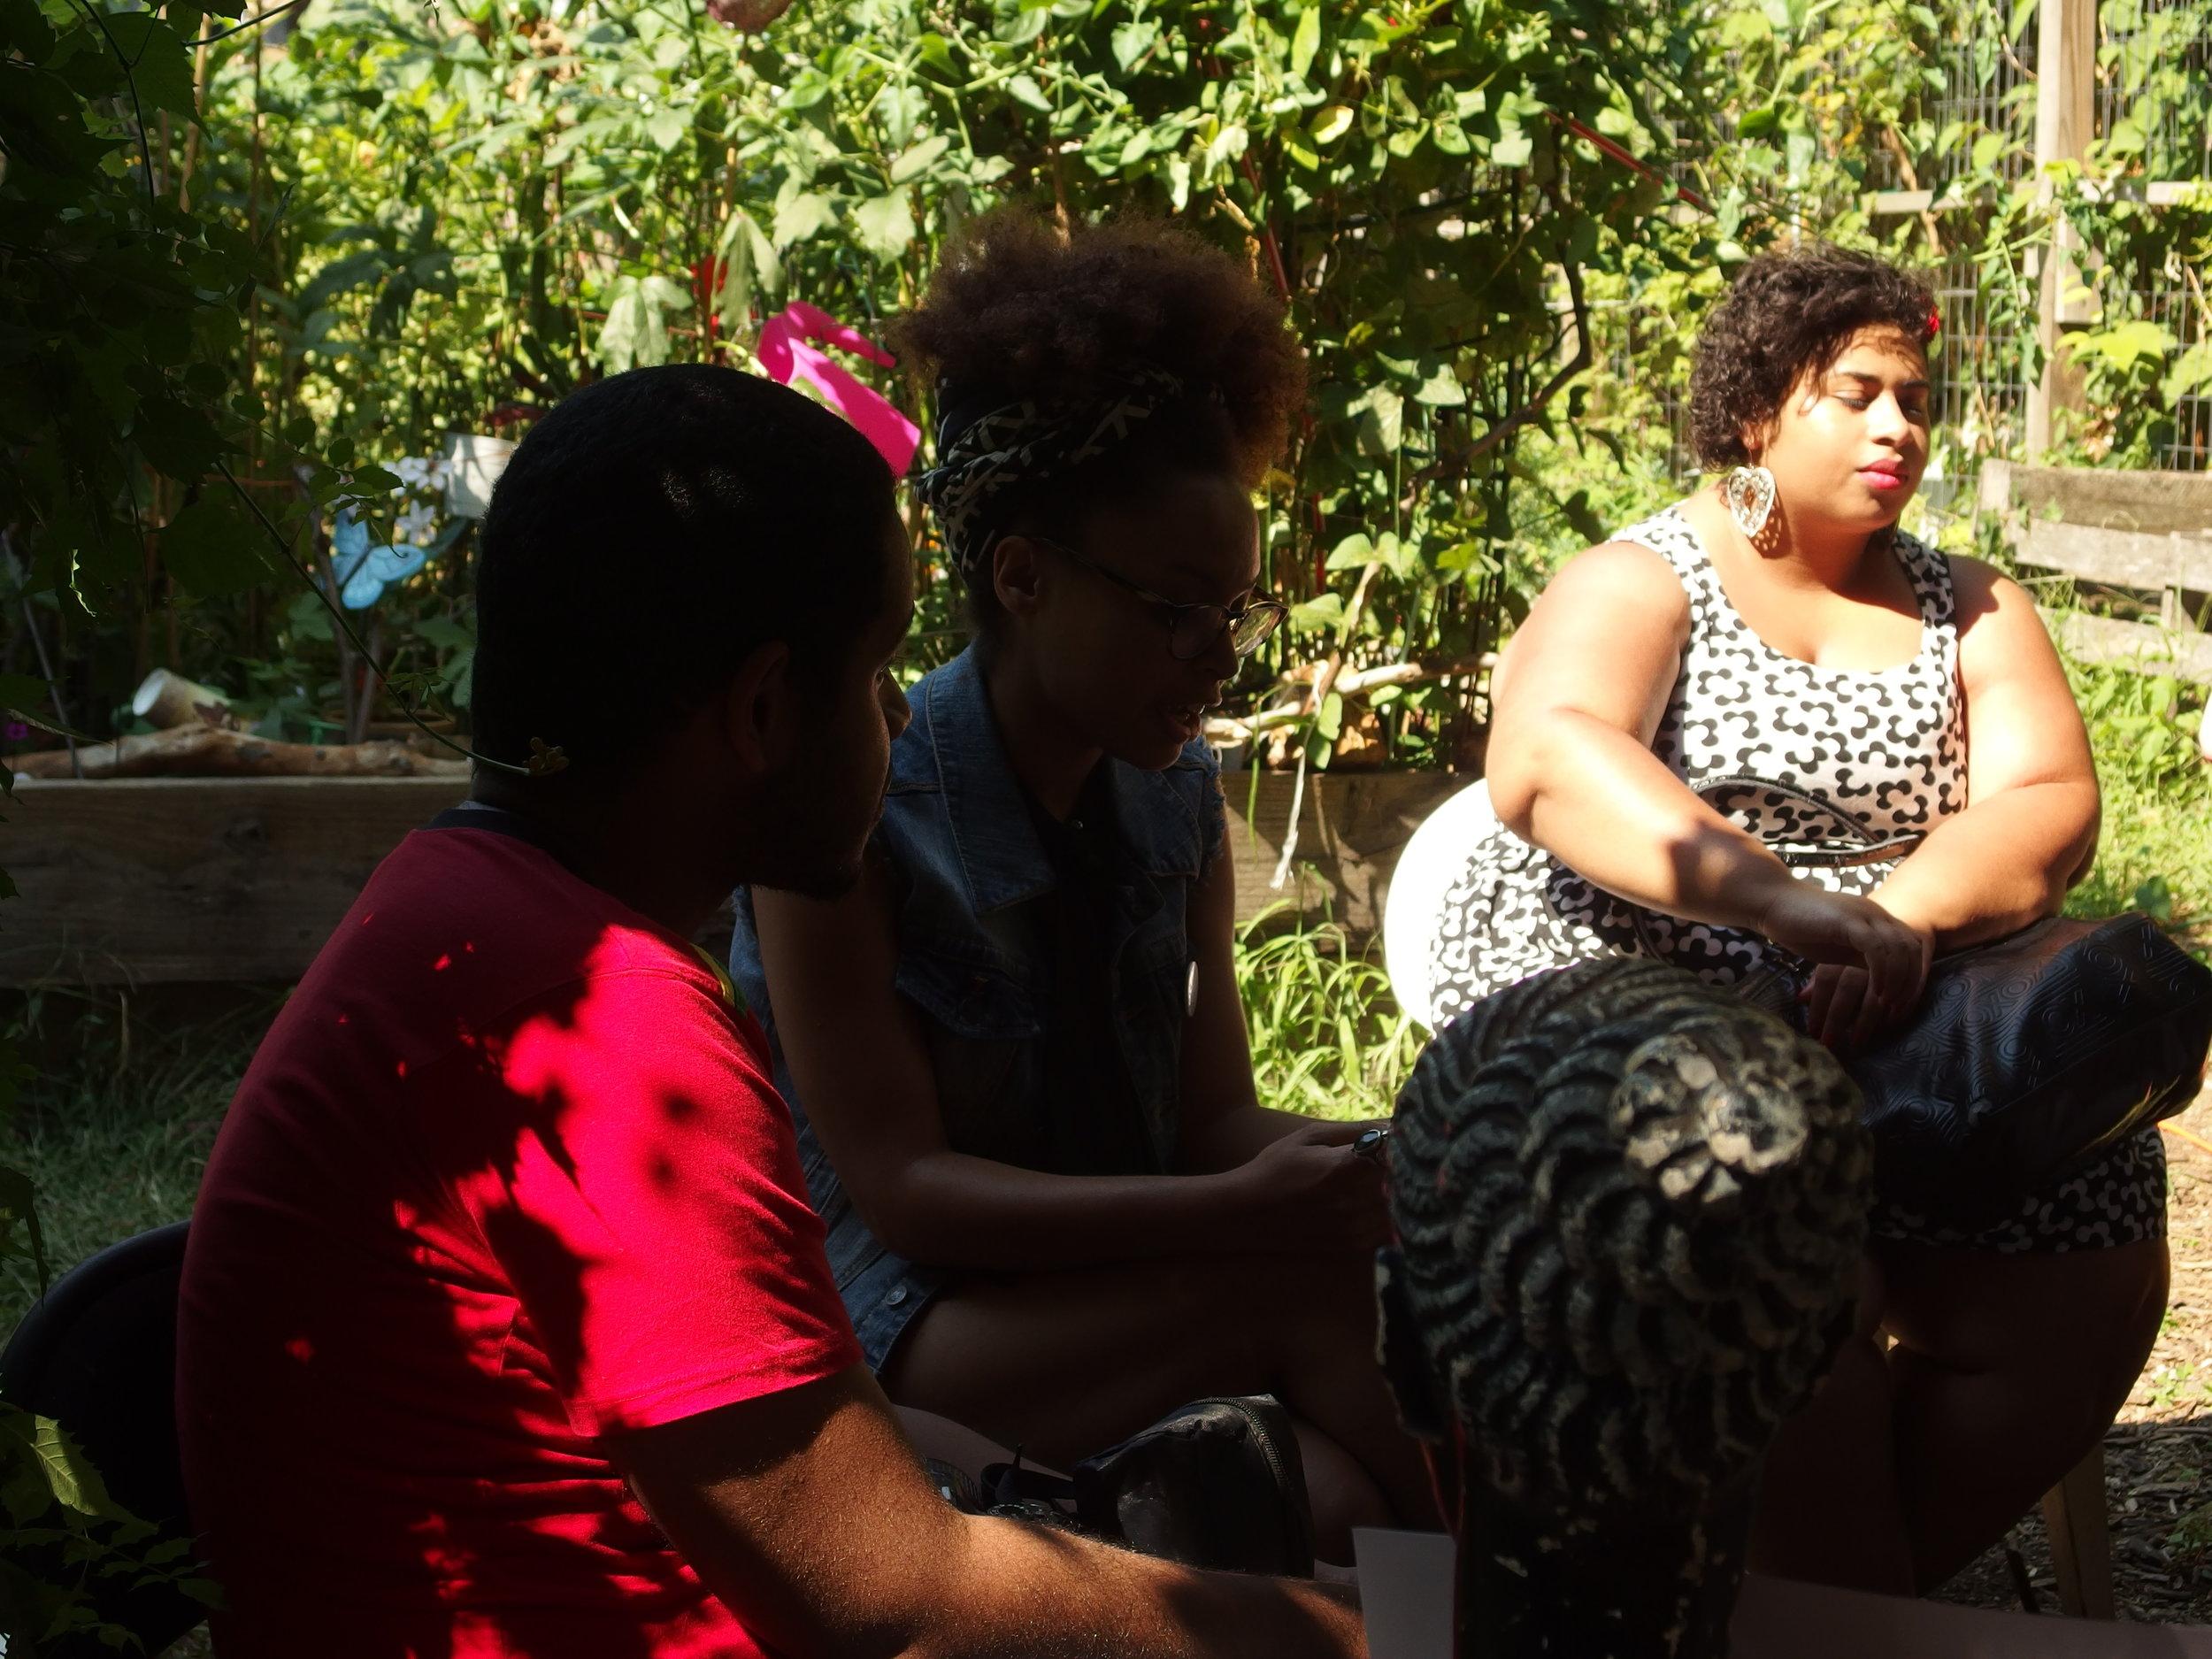 little-free-black-womens-library_20763052620_o.jpg